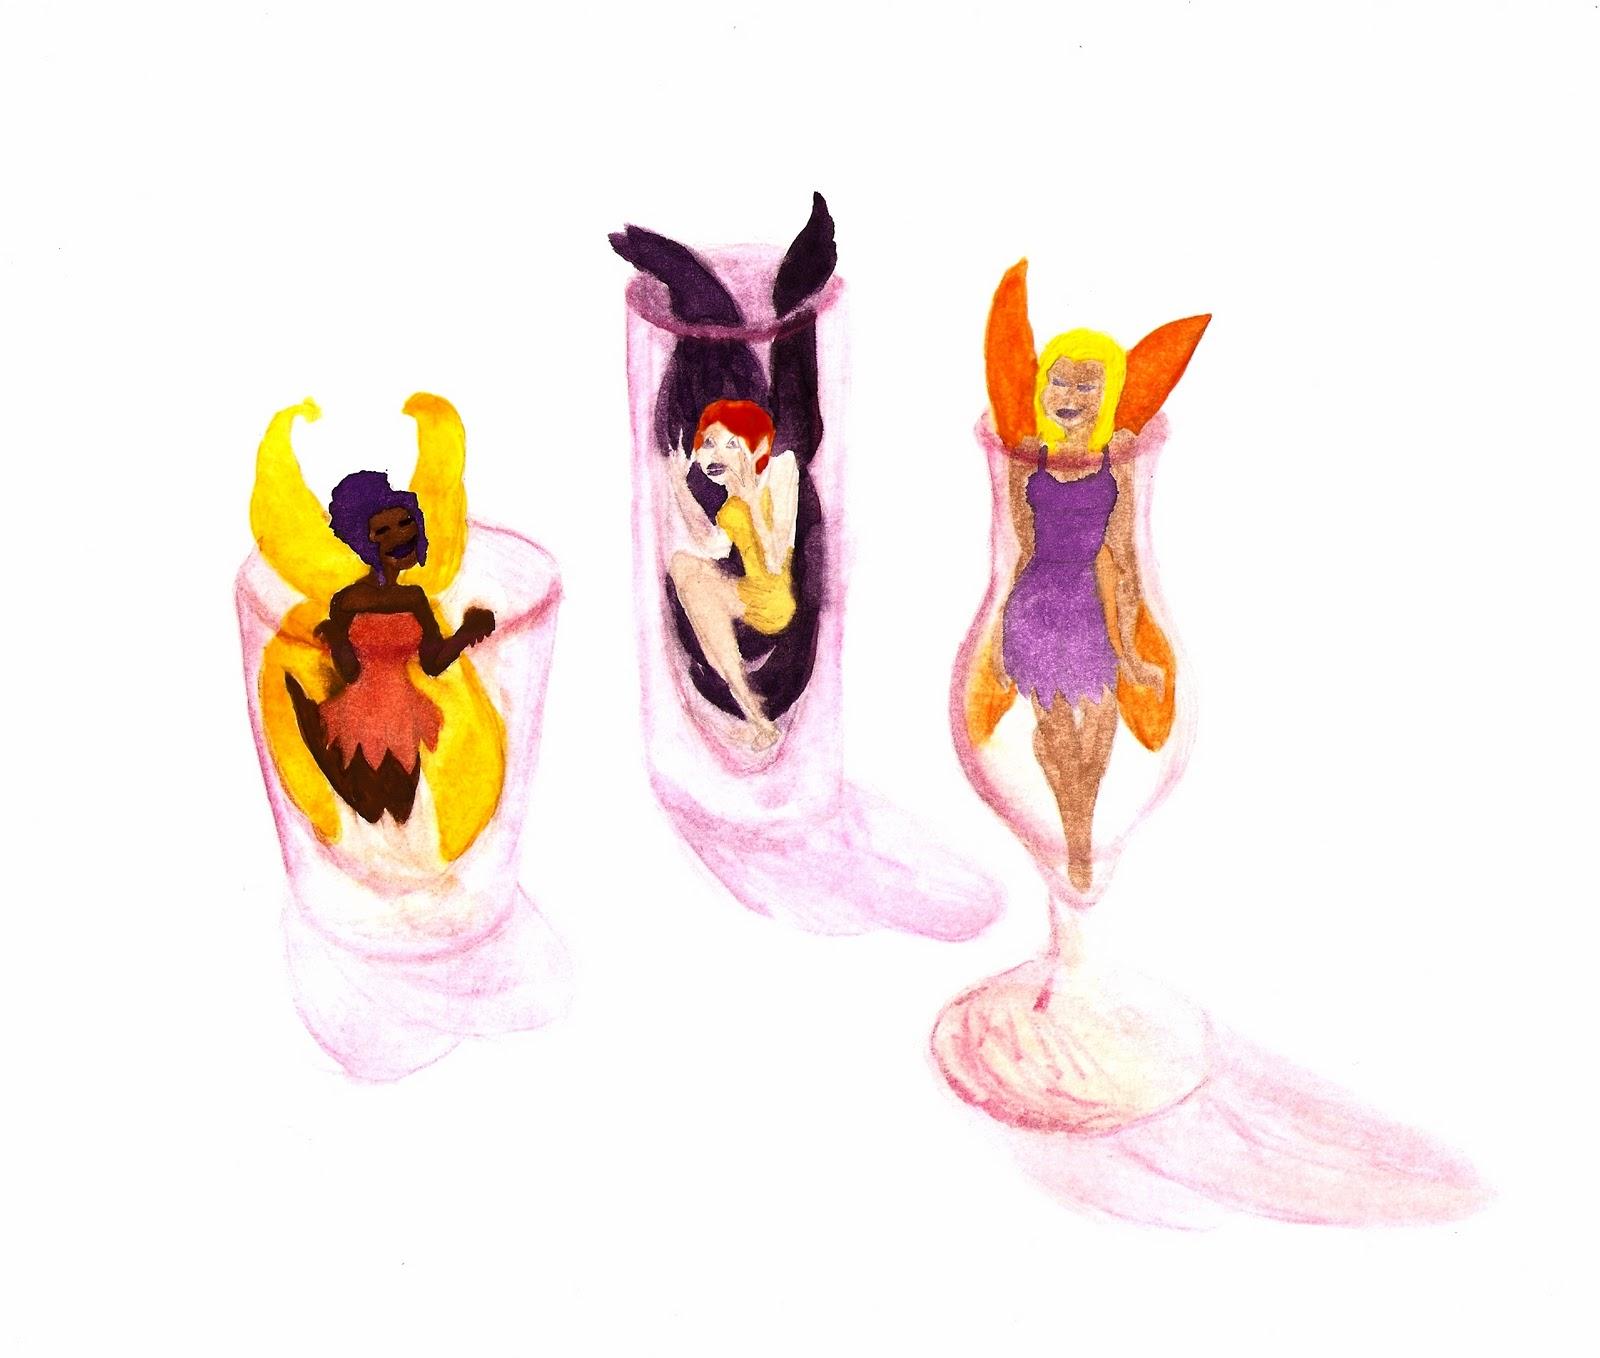 http://2.bp.blogspot.com/_hC9qYGa7L-8/TSW9W02T7XI/AAAAAAAAADA/6cEZCZIJ1V8/s1600/fairy.jpg